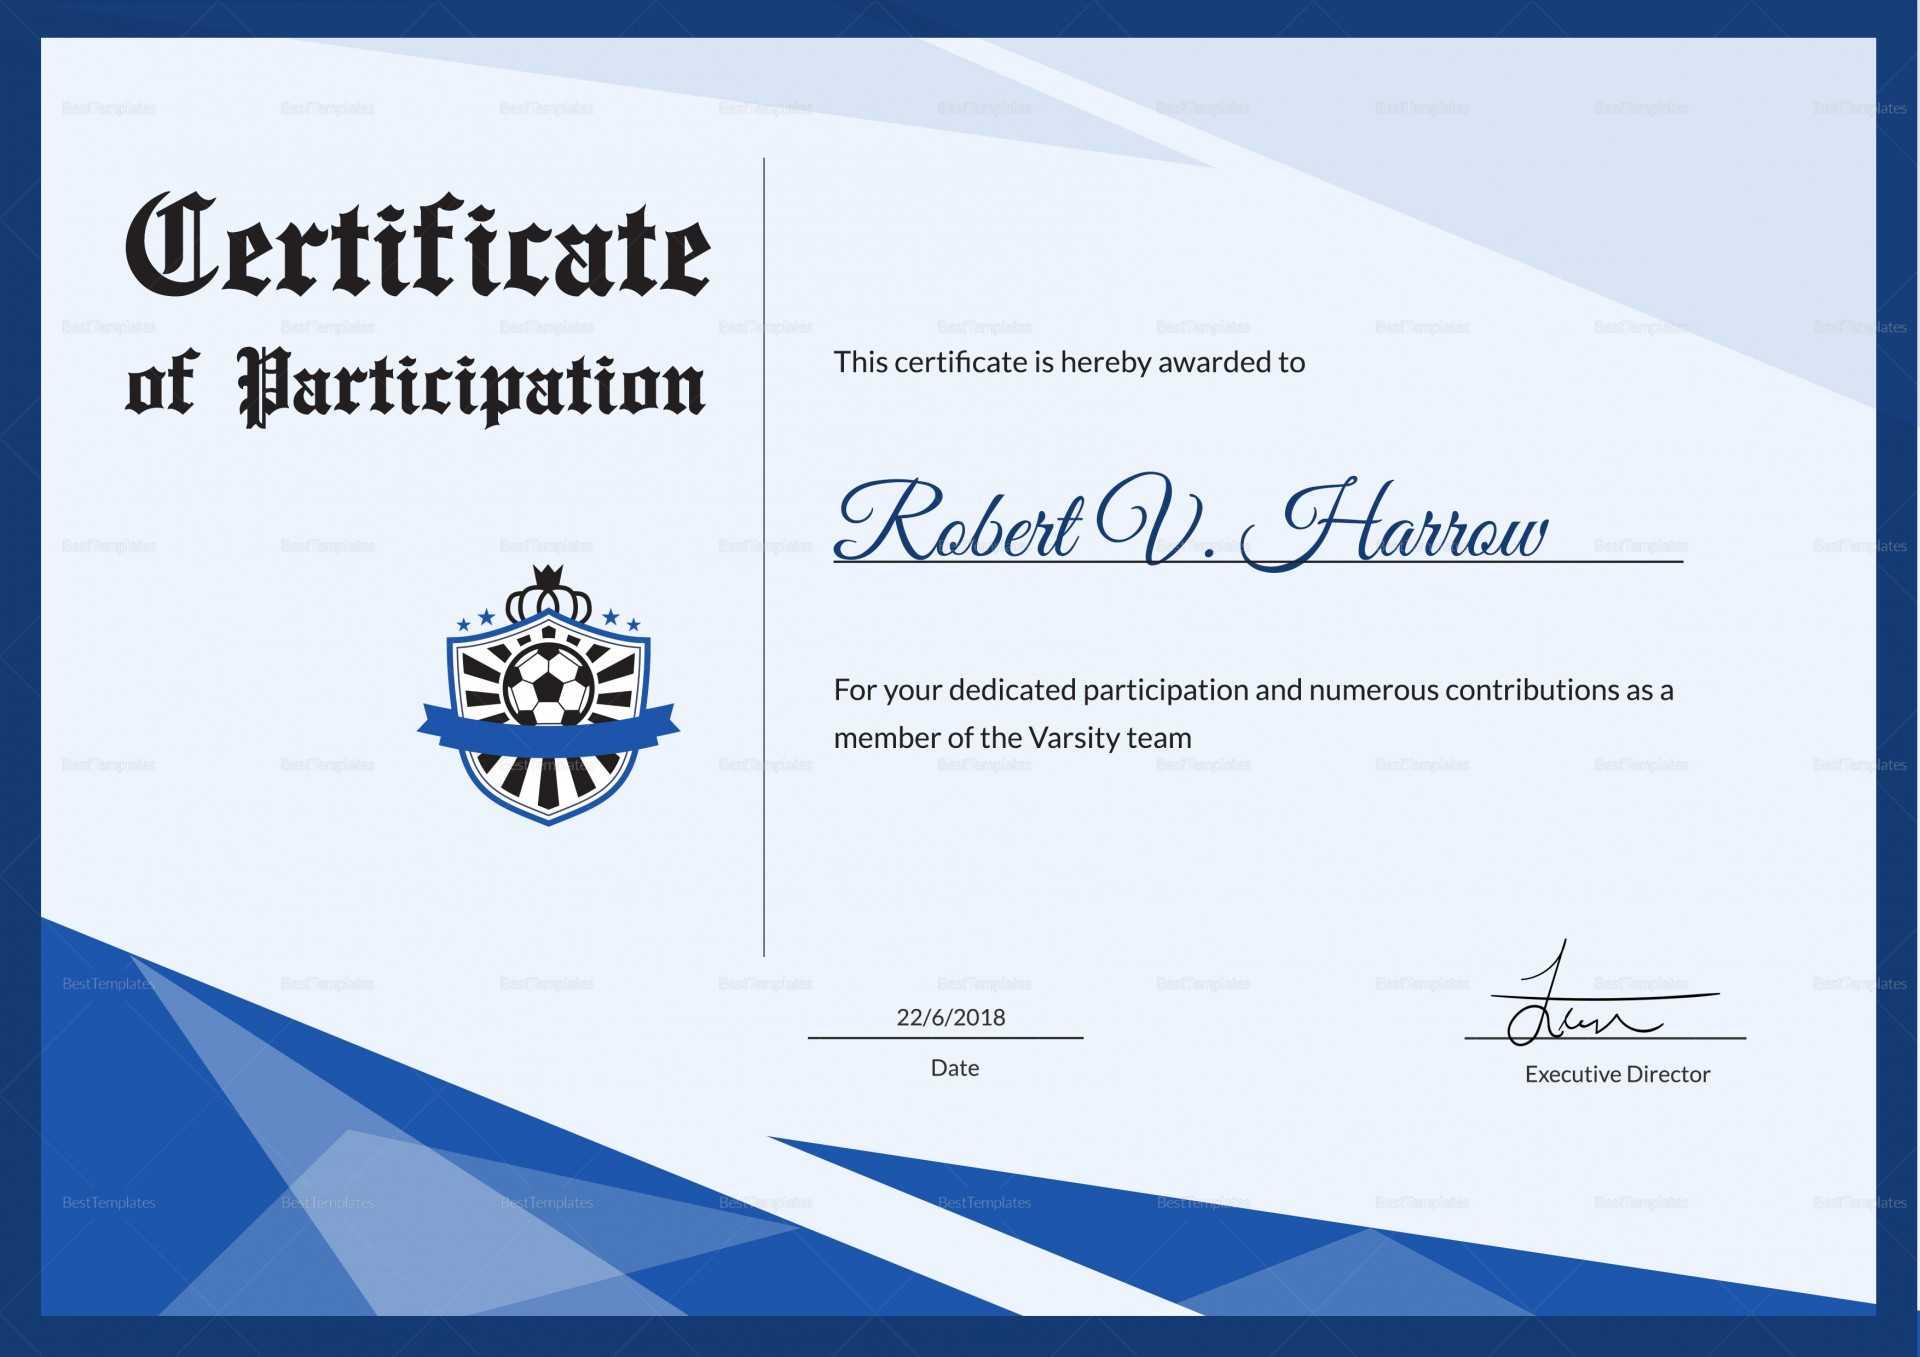 013 Sports Award Certificate Template Word Soccer Throughout Sports Award Certificate Template Word